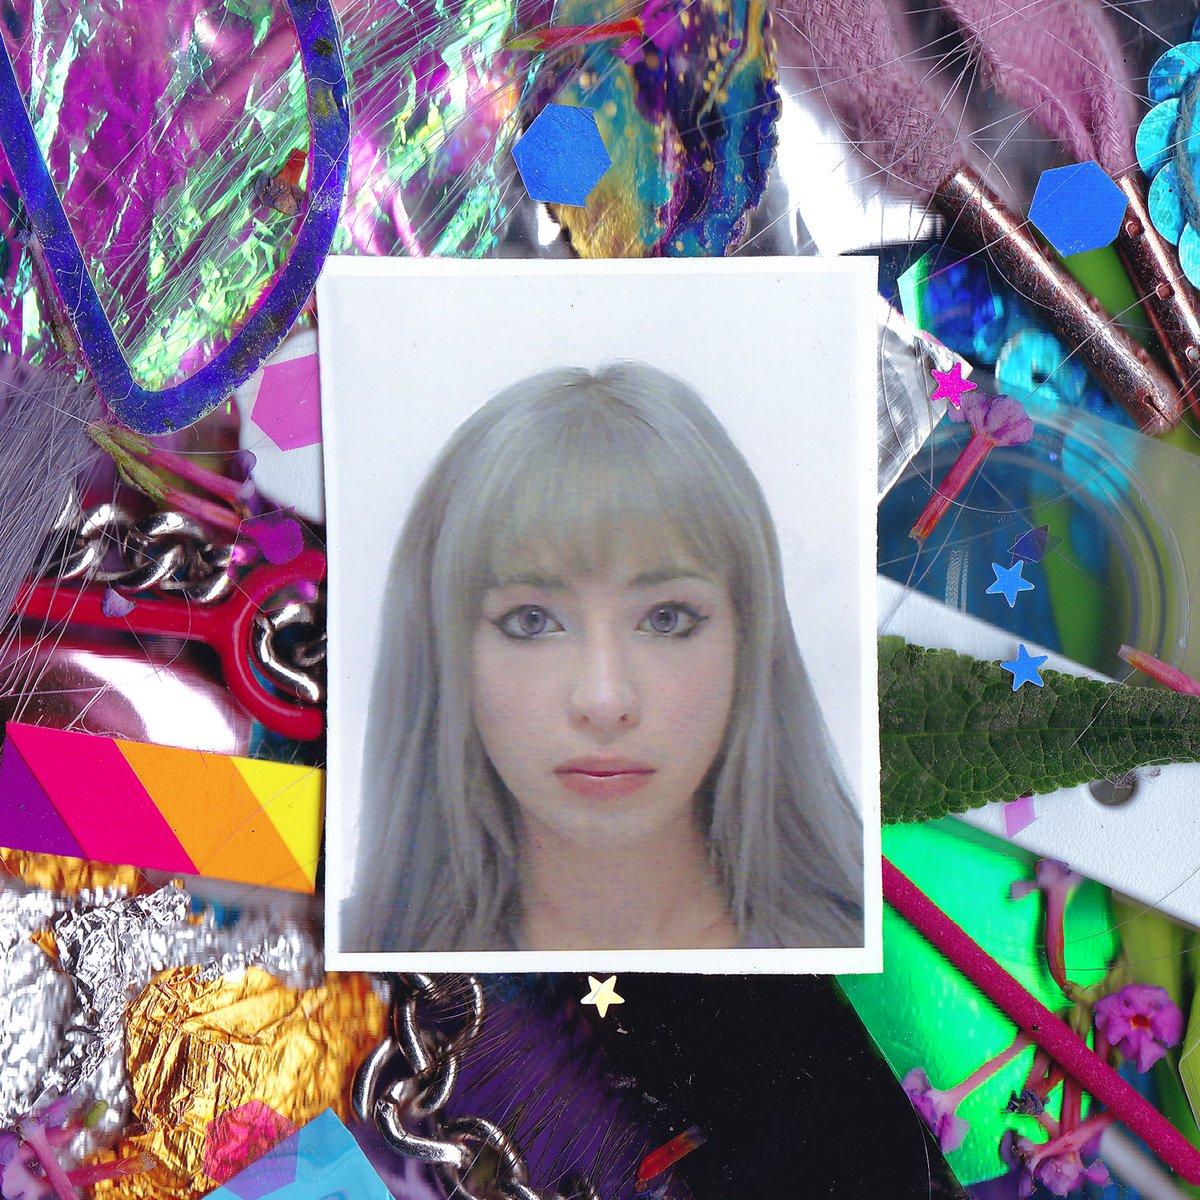 kero kero bonito flamingo time n place рецензия альбом 2018